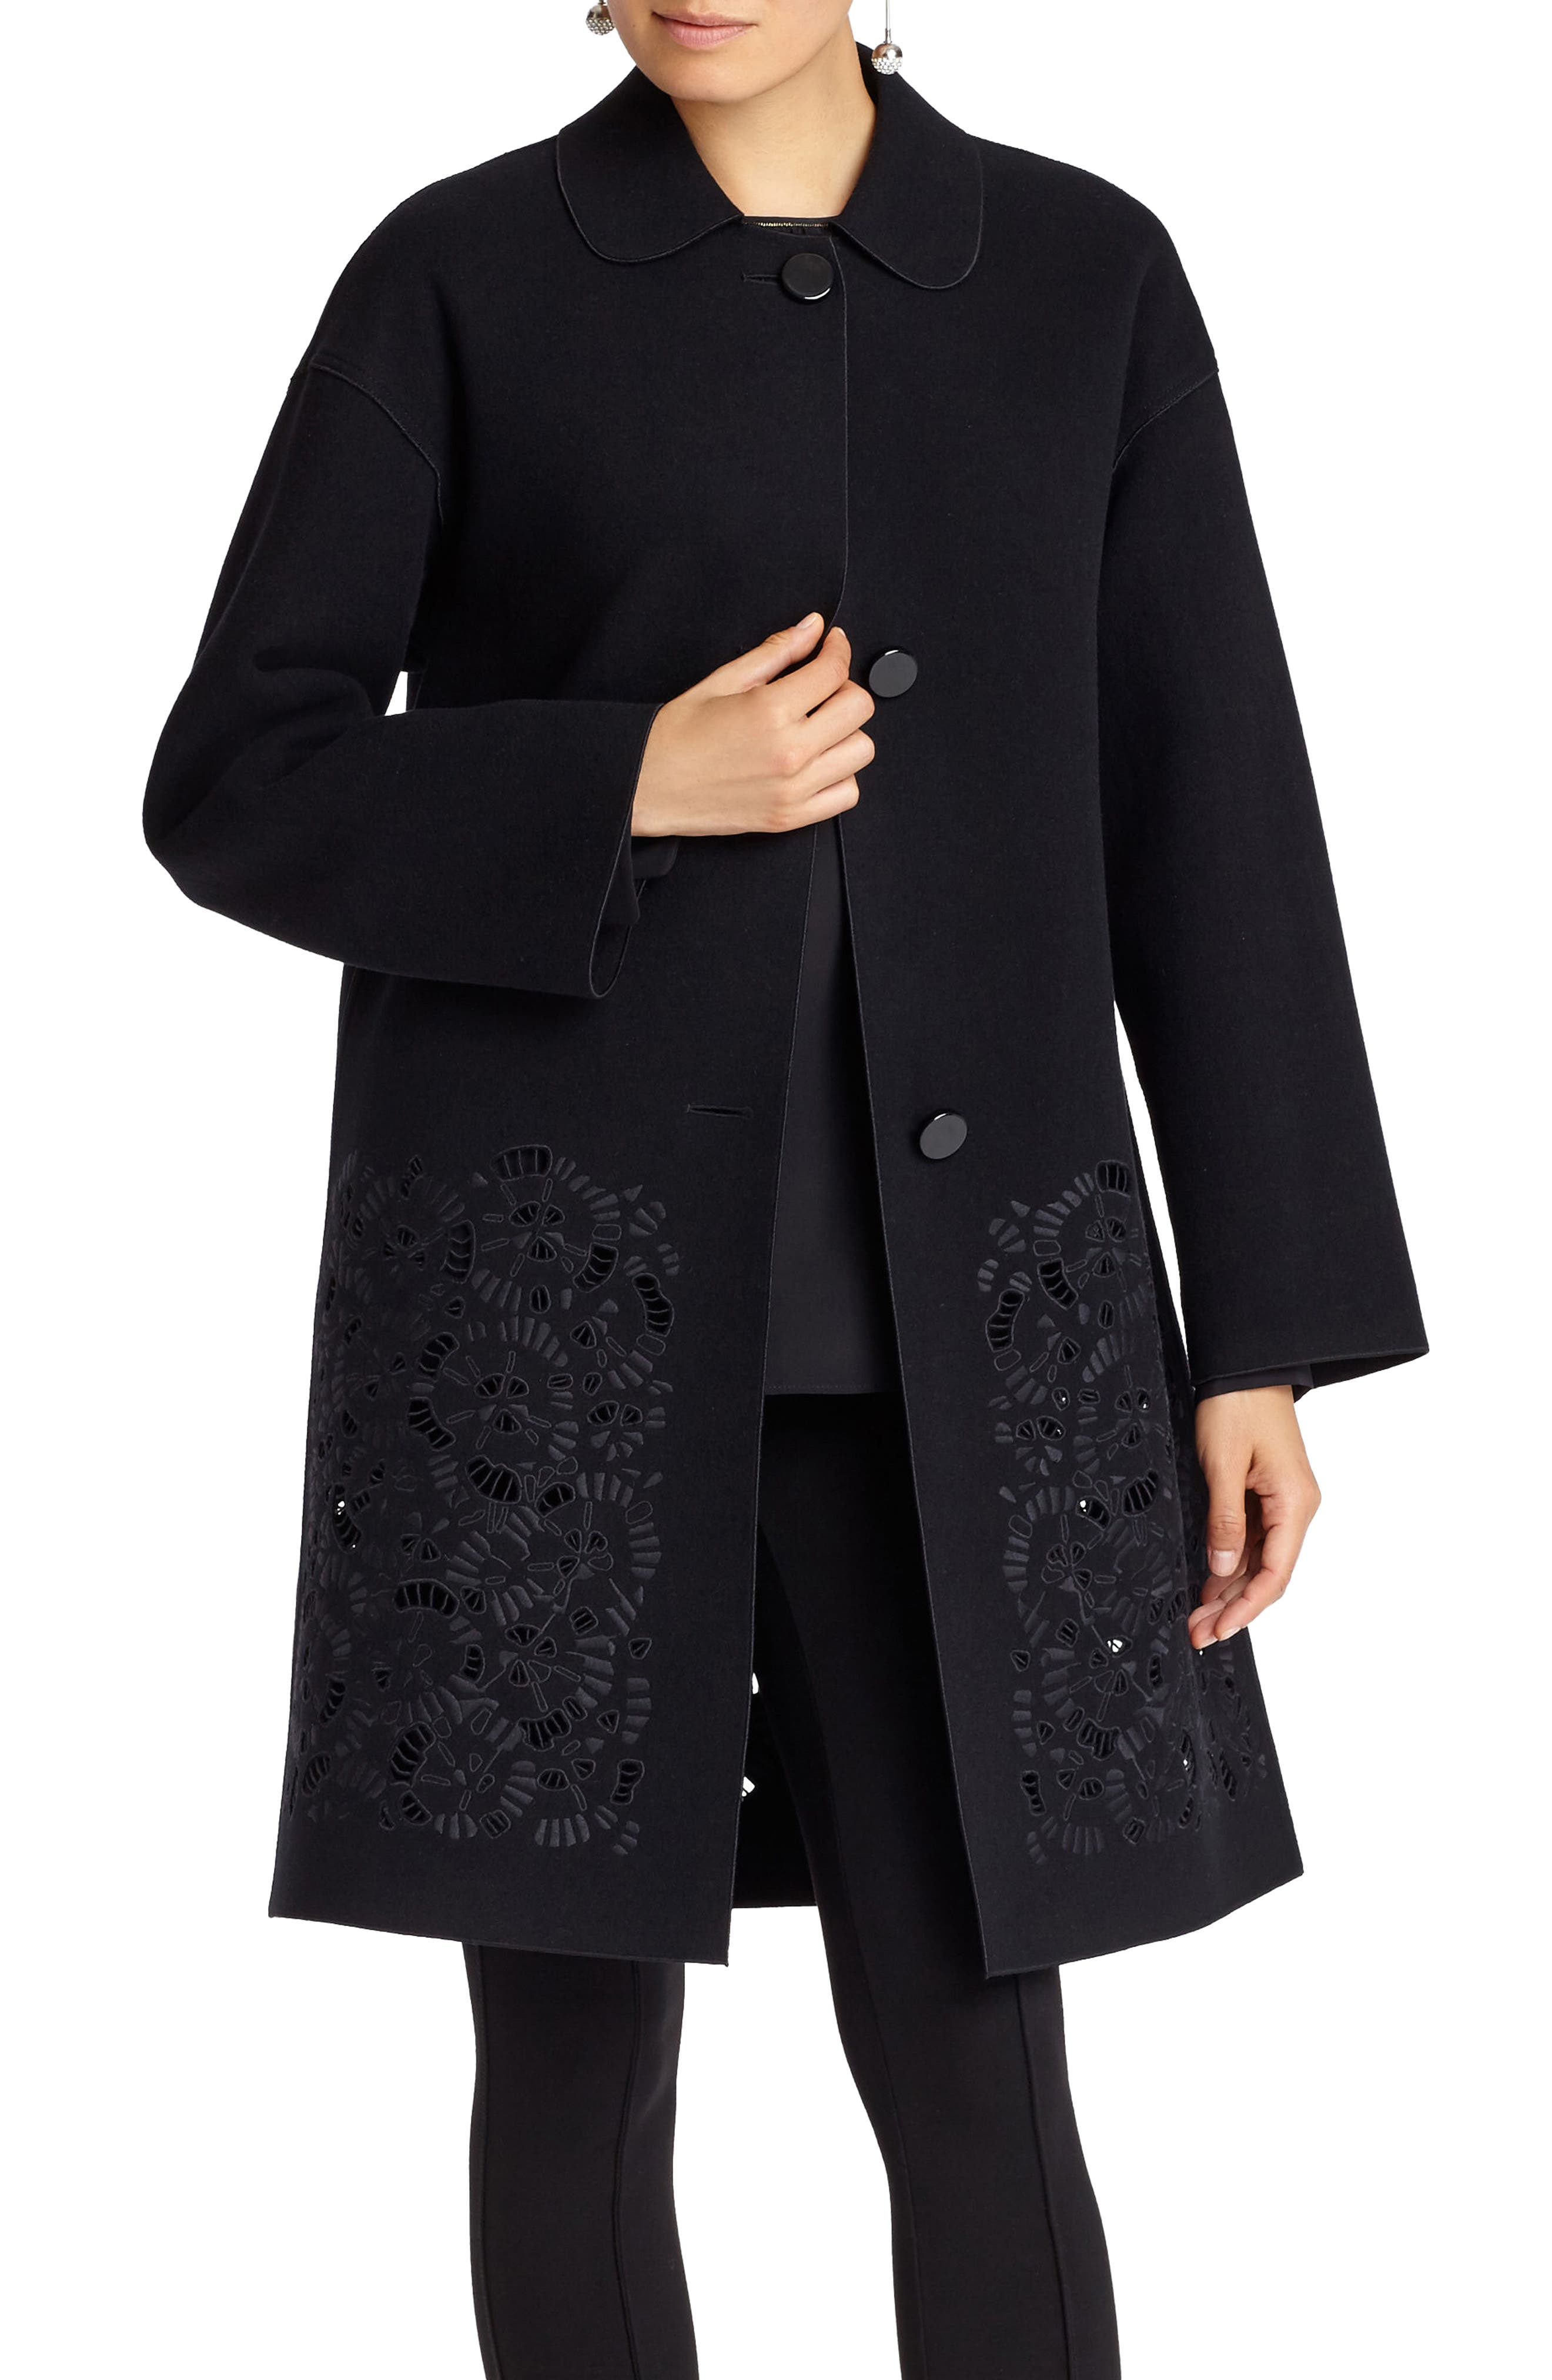 Vita Laser Cut Embroidered Coat,                             Main thumbnail 1, color,                             Black